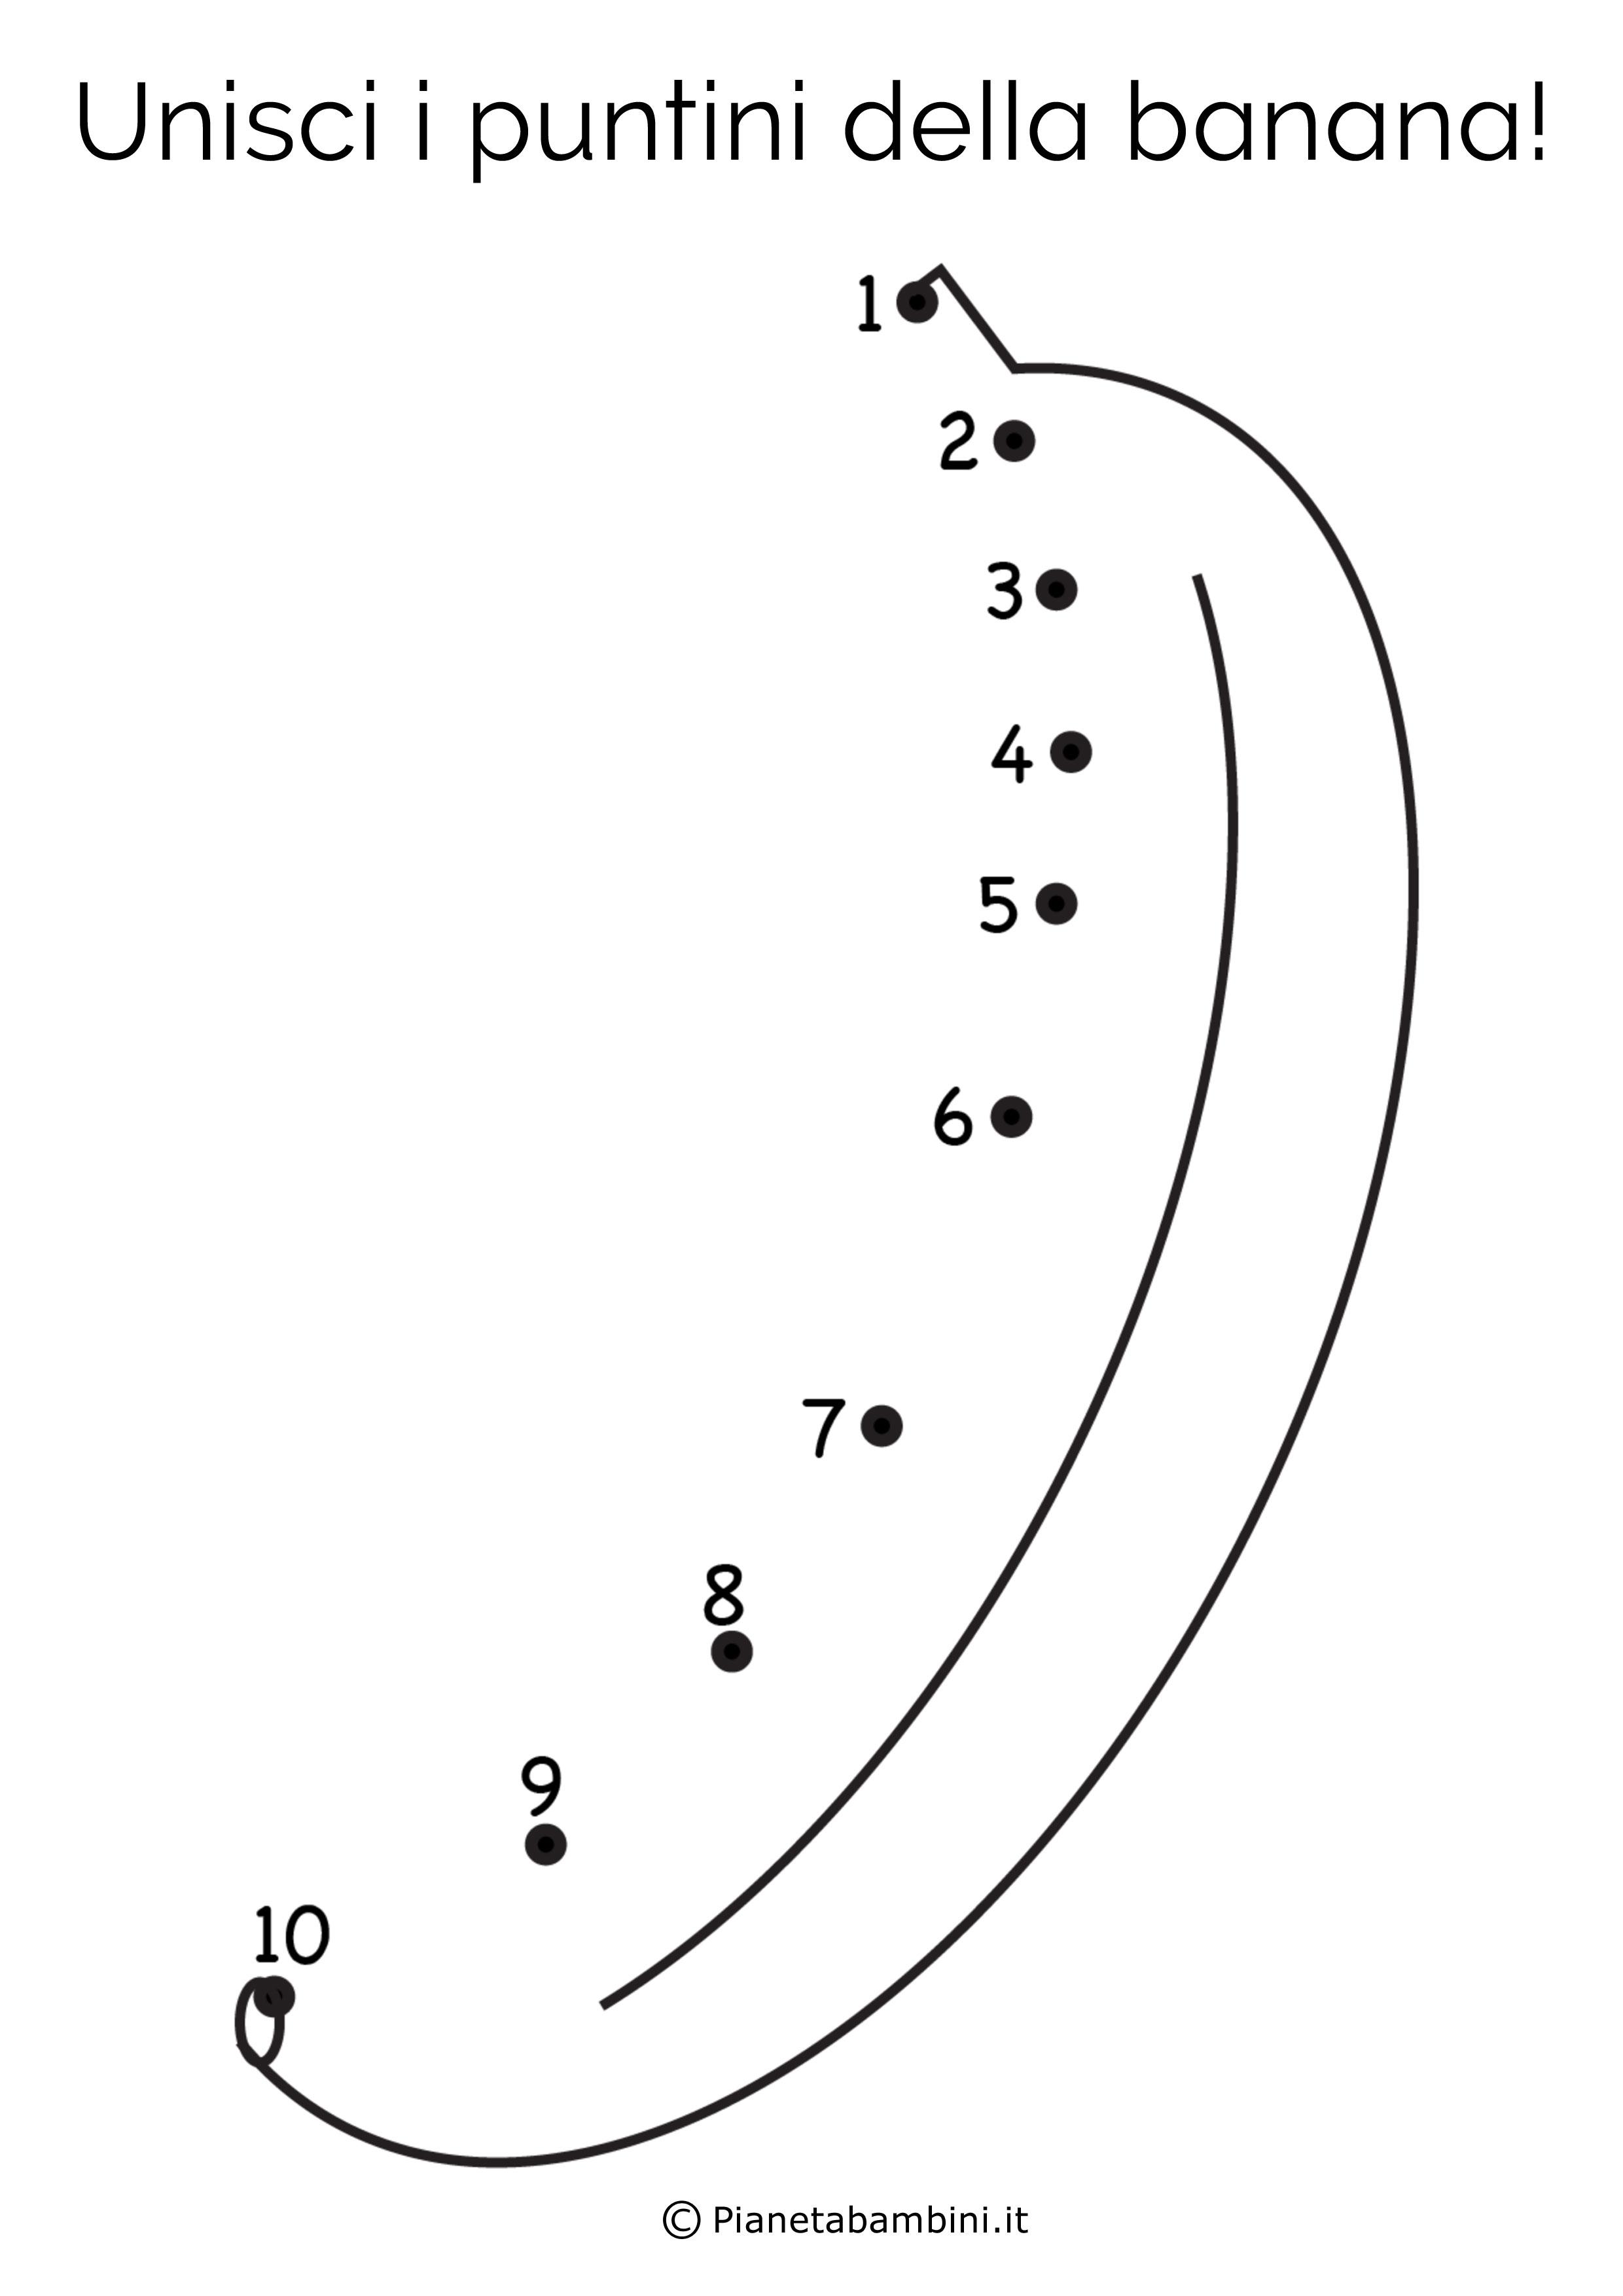 Disegno unisci i puntini banana